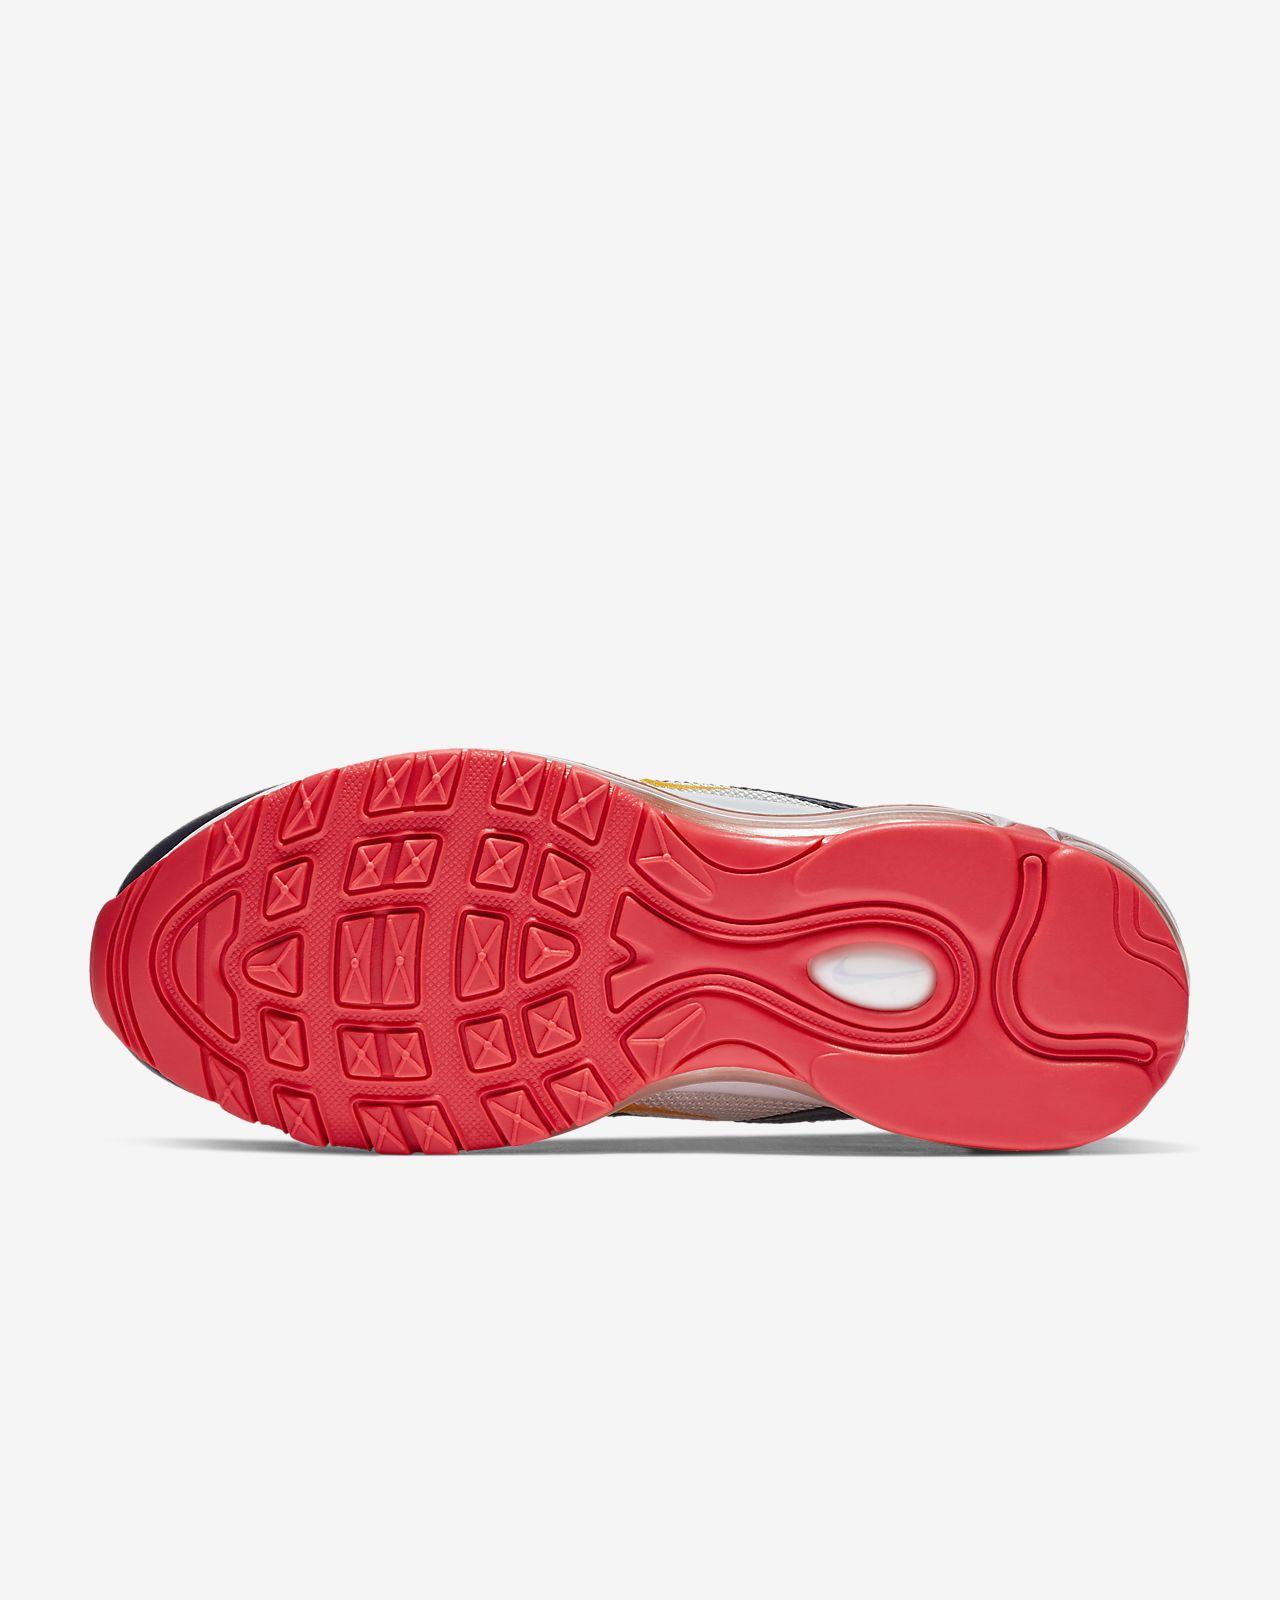 premium selection 7efde 5aee8 ... Scarpa Nike Air Max 97 Premium - Donna